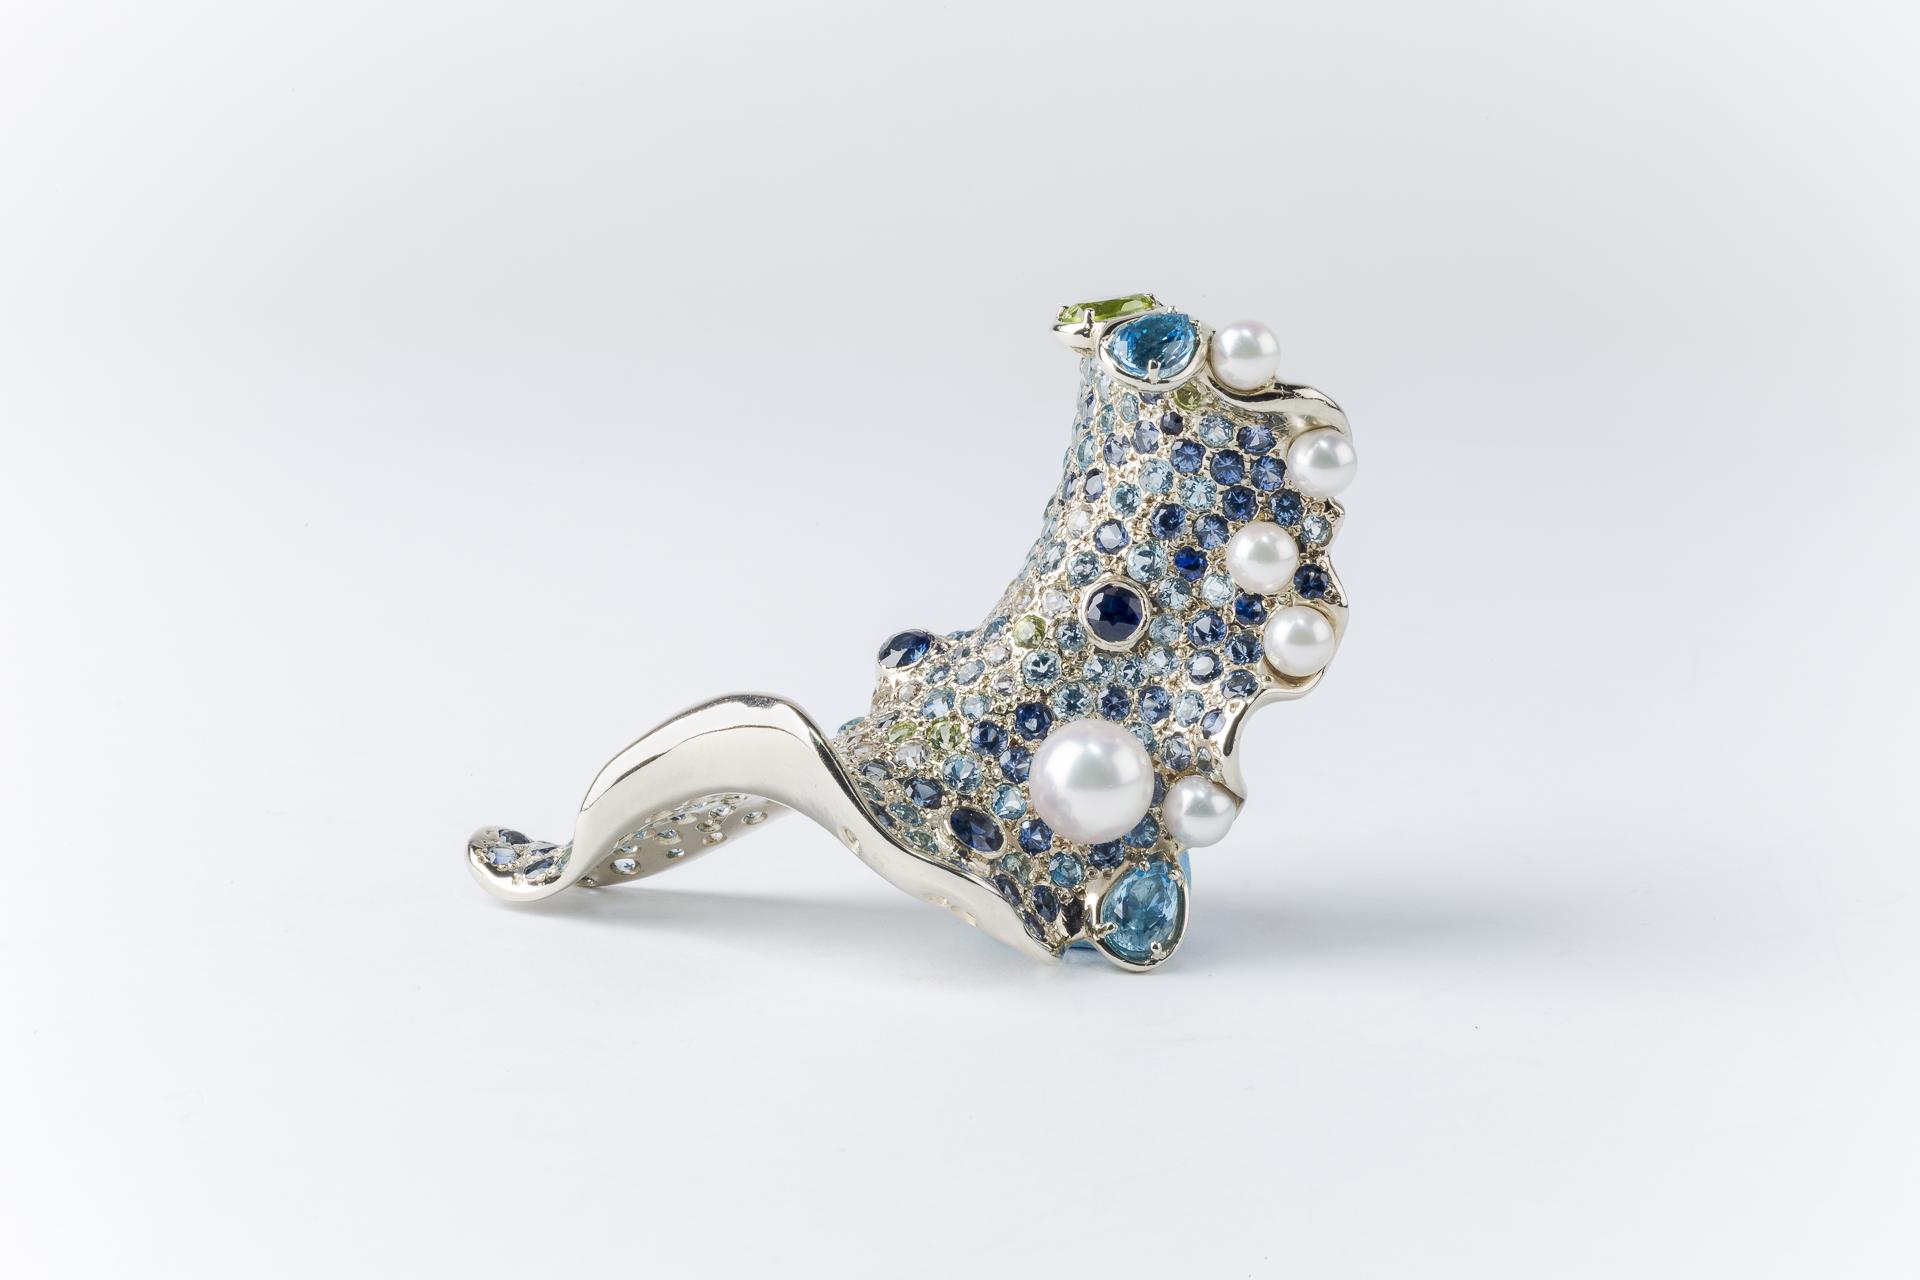 commercial-jewelry-photography-portfolio-005.jpg